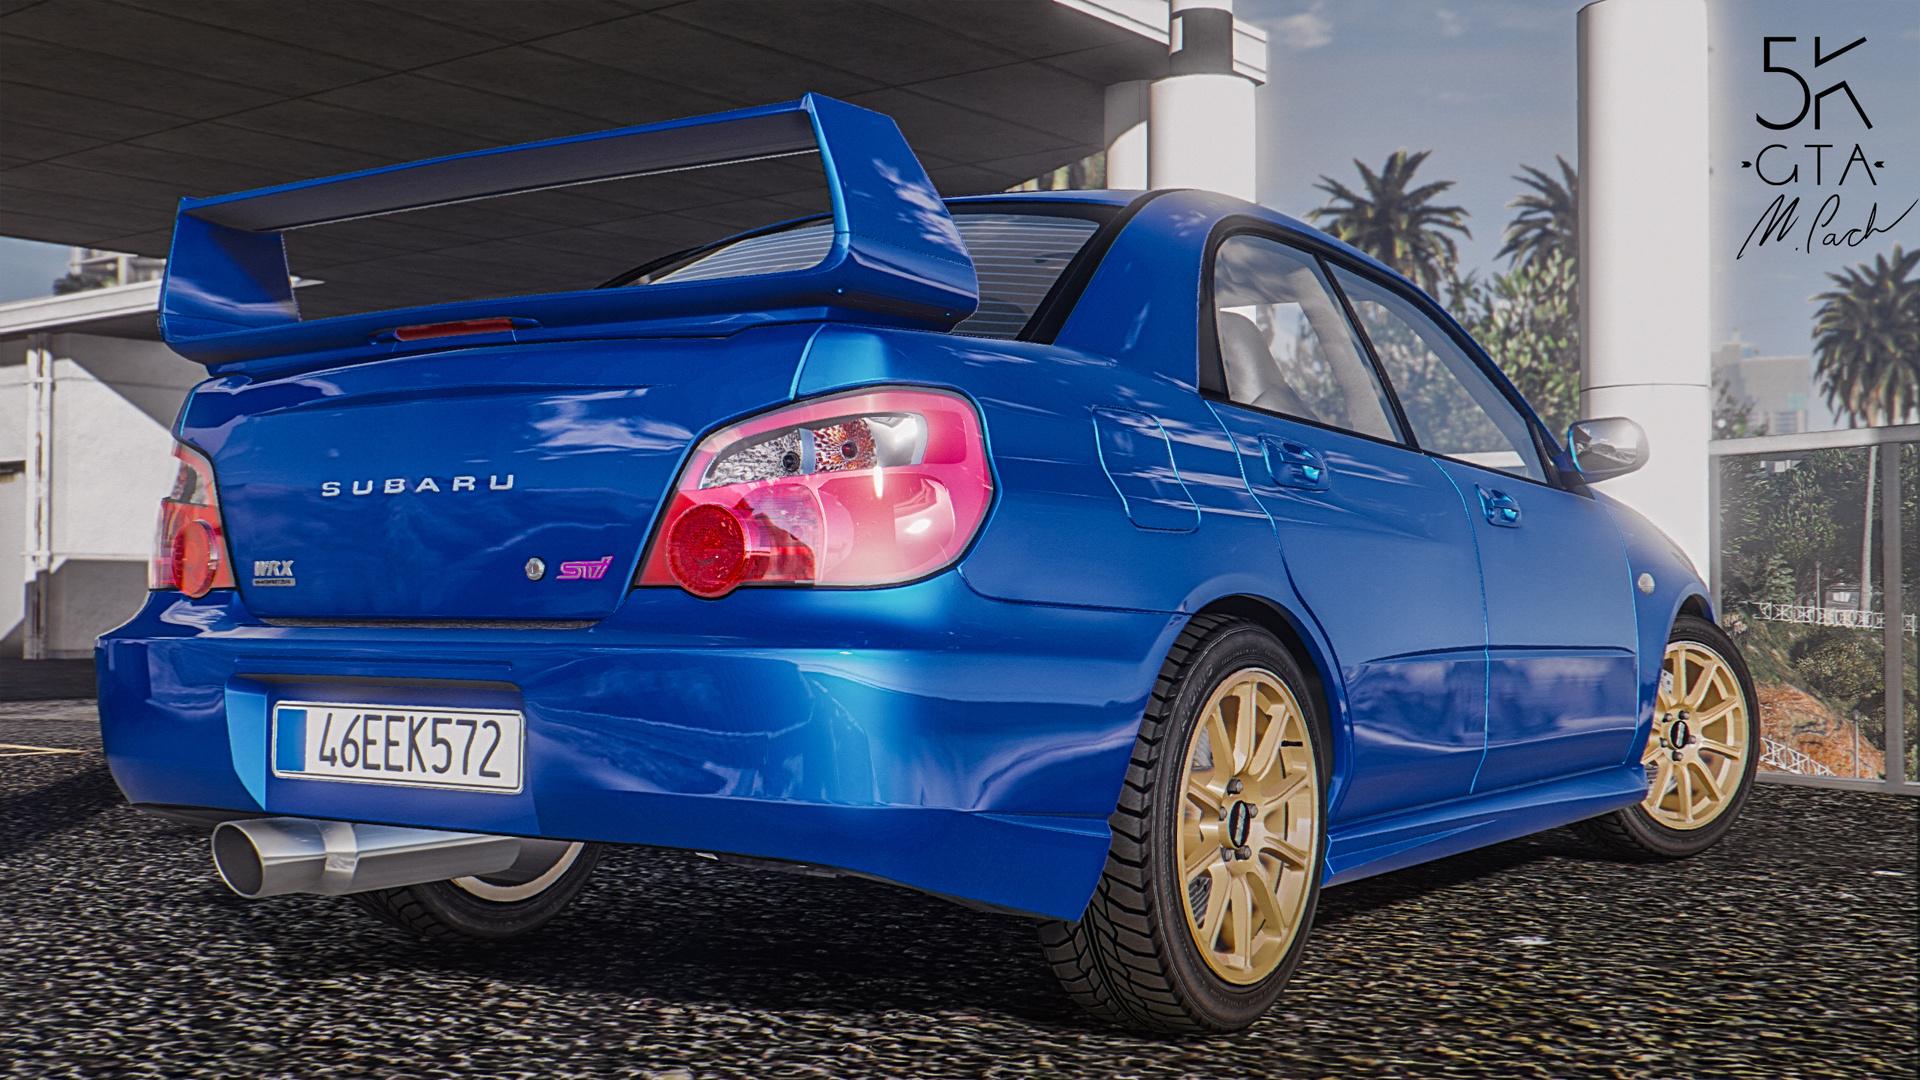 Subaru Impreza WRX STI 2004 [Add-On | Tuning] - GTA5-Mods.com